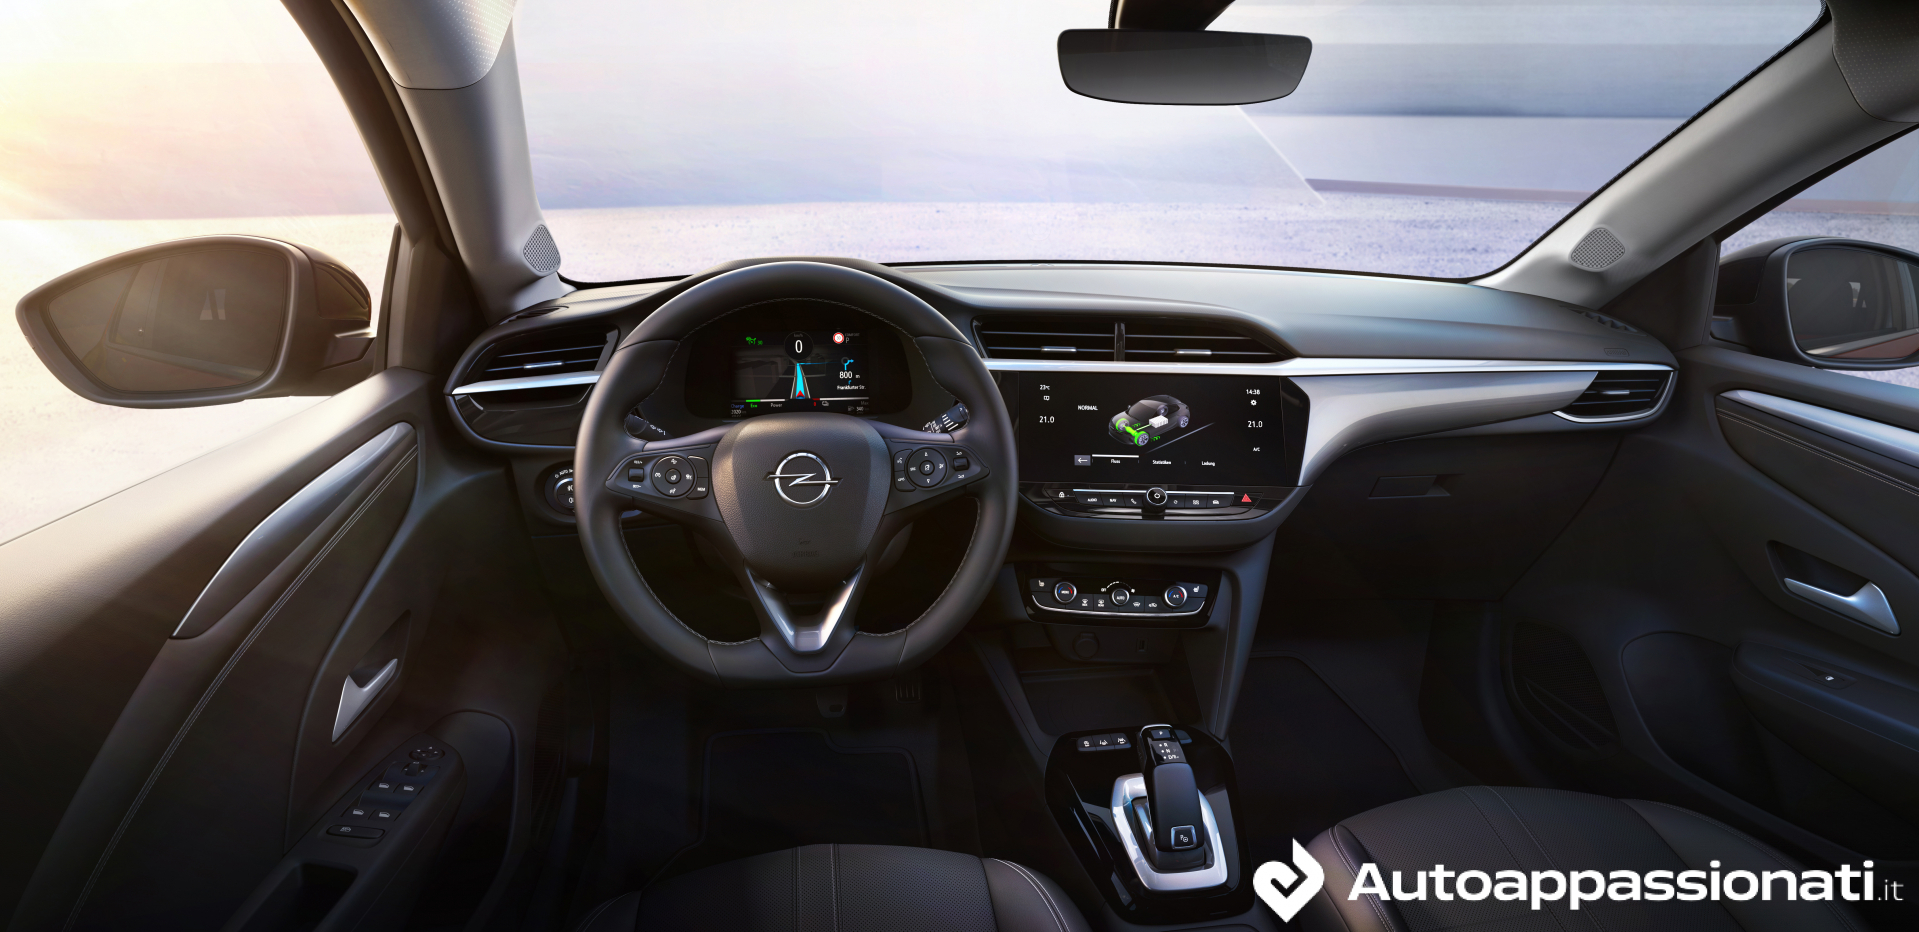 Opel Corsa-e 2019 interni display